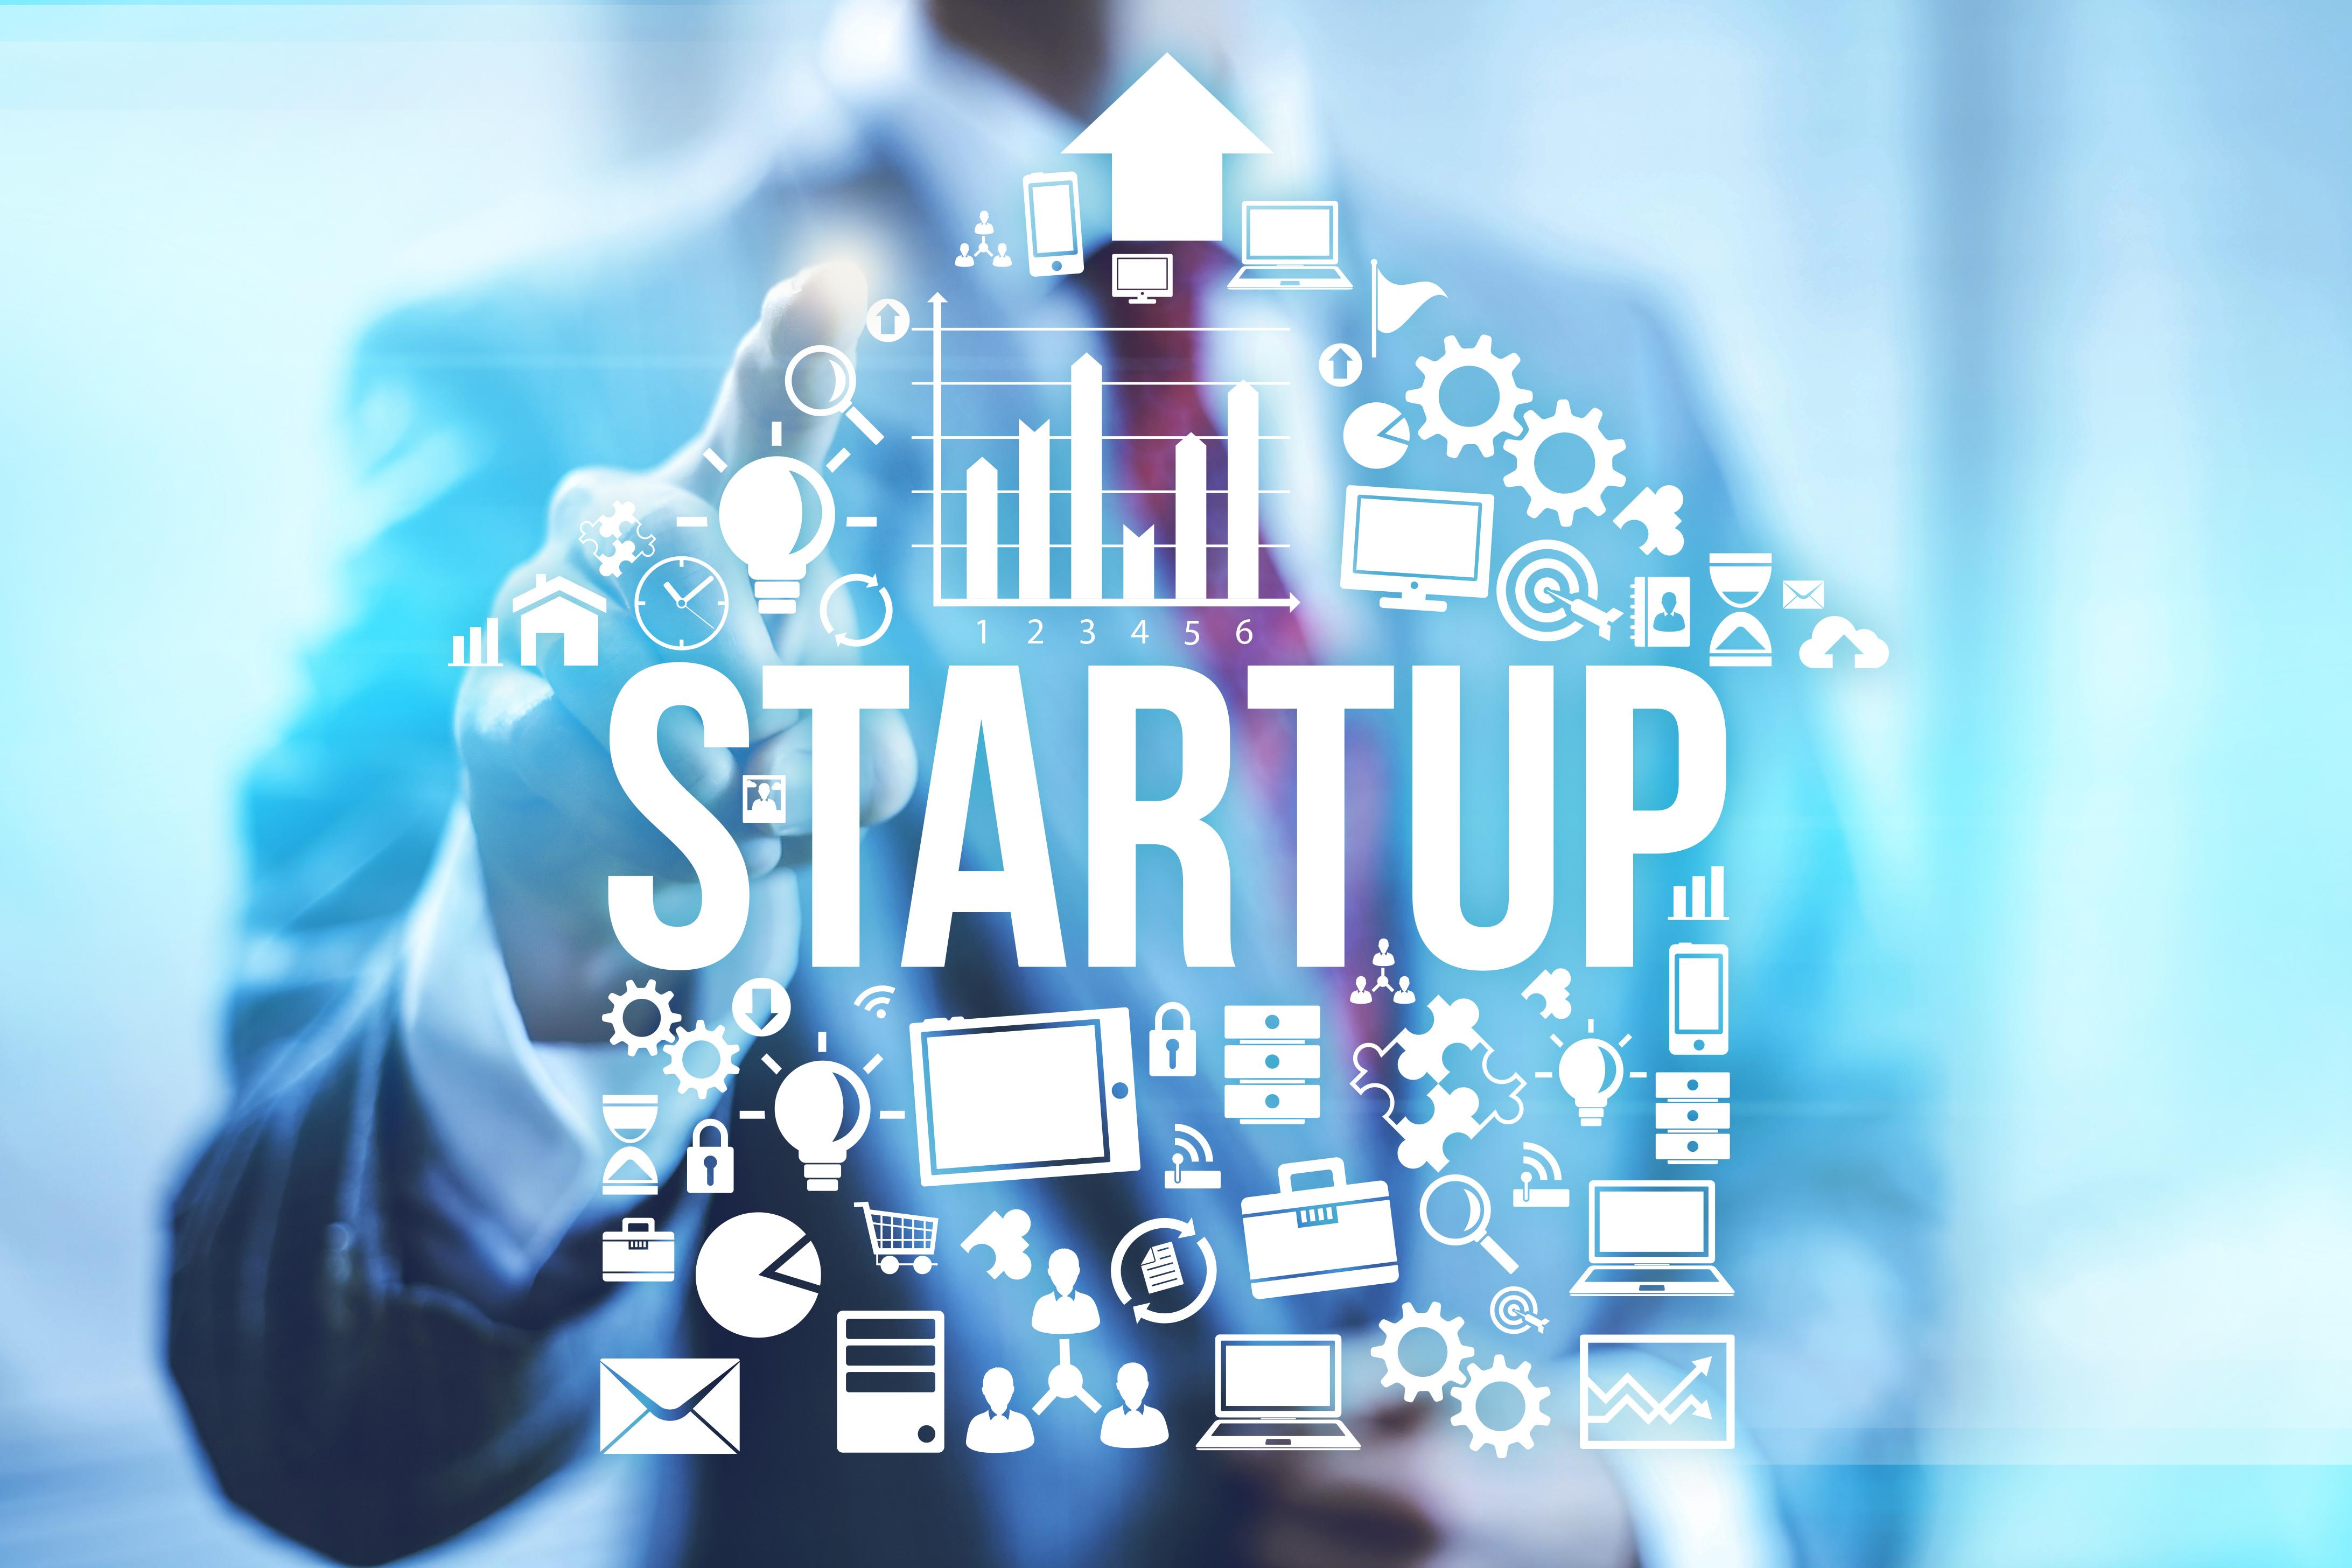 #structure #startup #croissance #growth #methodologie #diagnostic #process #dashboard #tableaudebord